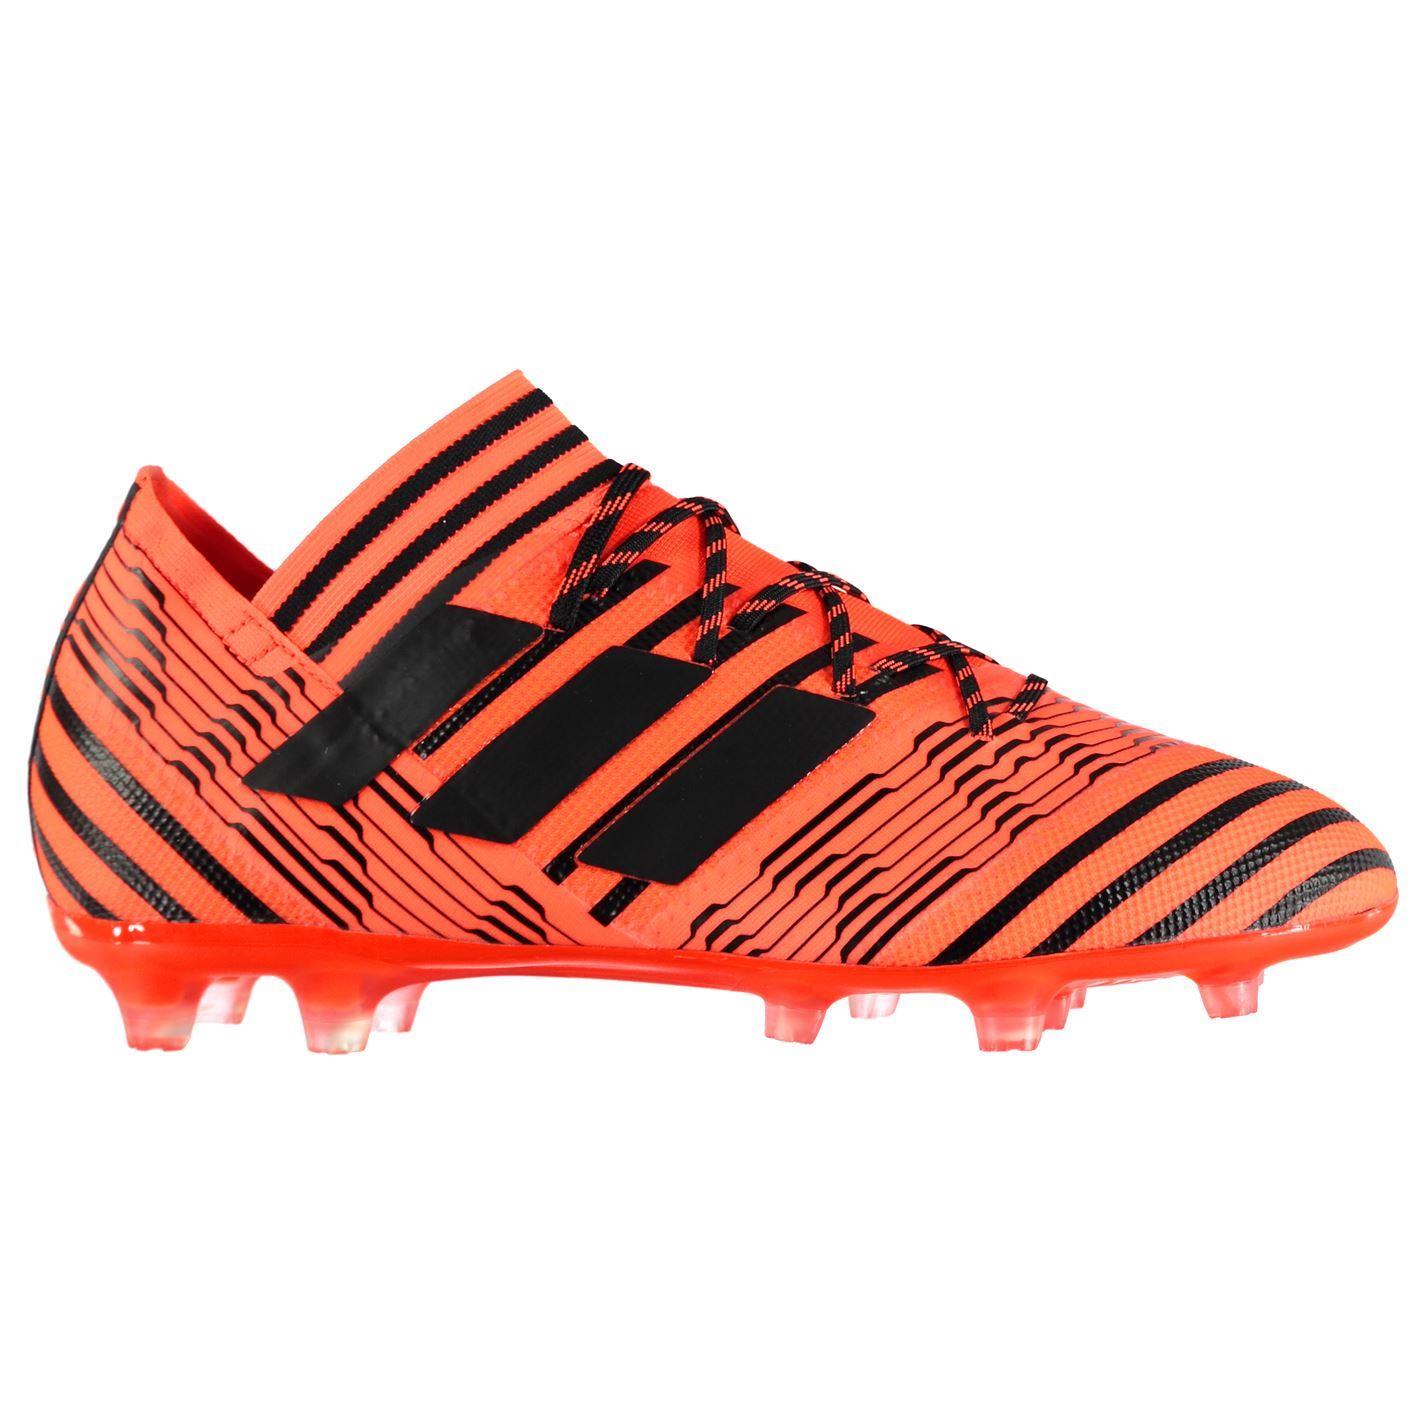 ccb5b41c48b adidas Nemeziz 17.2 Firm Ground Football Boots Mens Orange Black Soccer  Cleats